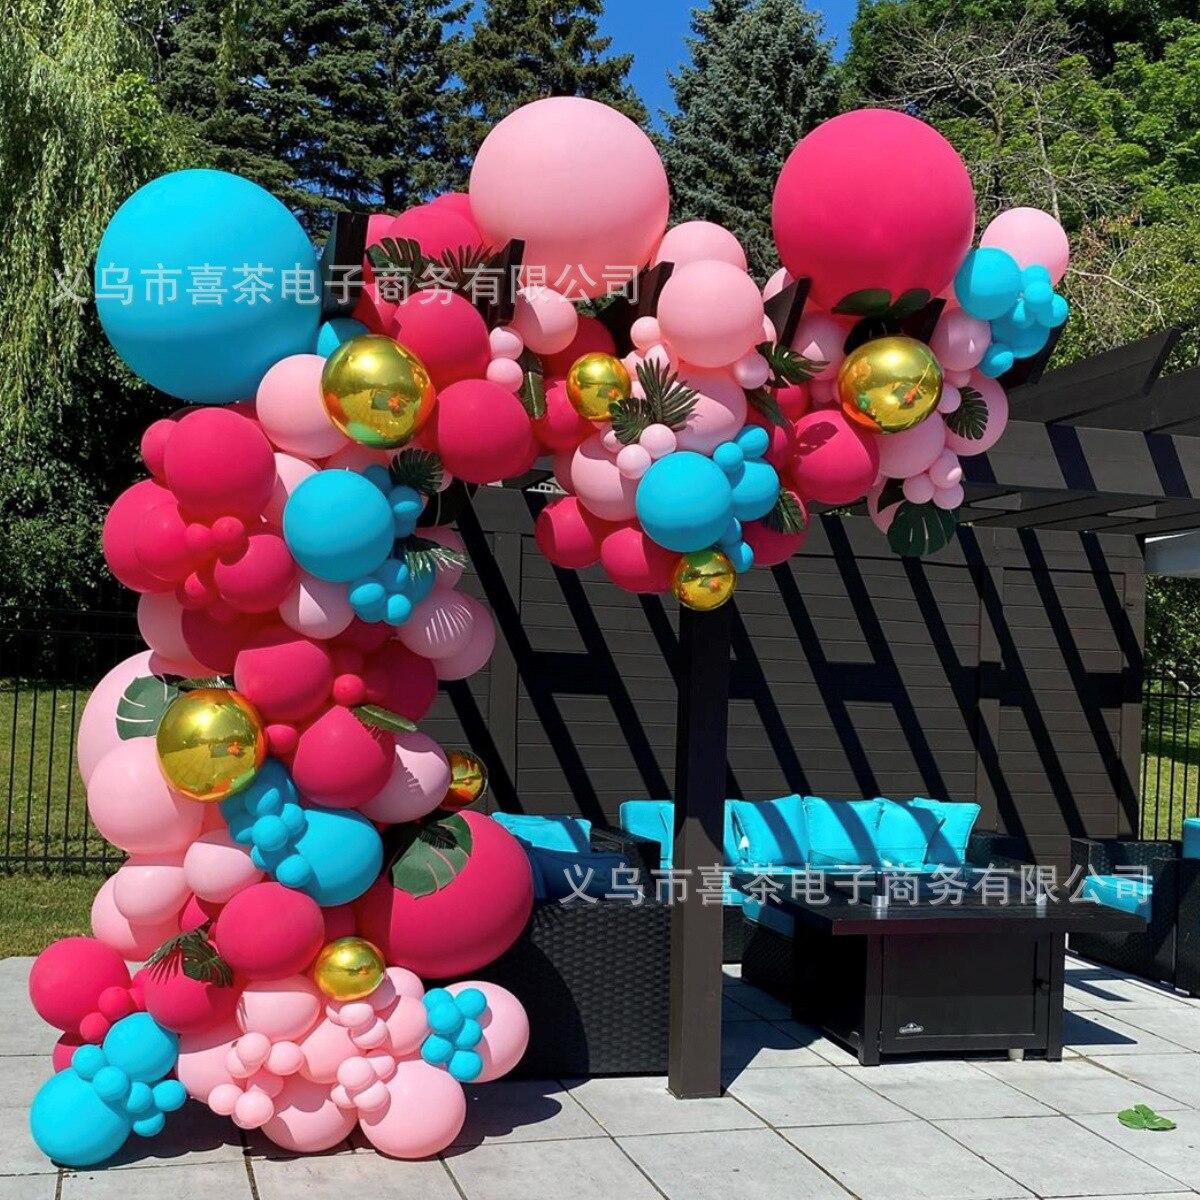 2021 New DIY Balloon Garland and Blue Colorful Paper Scrap Balloon Hawaiian Tropical Theme Party Balloon Chain Decorations